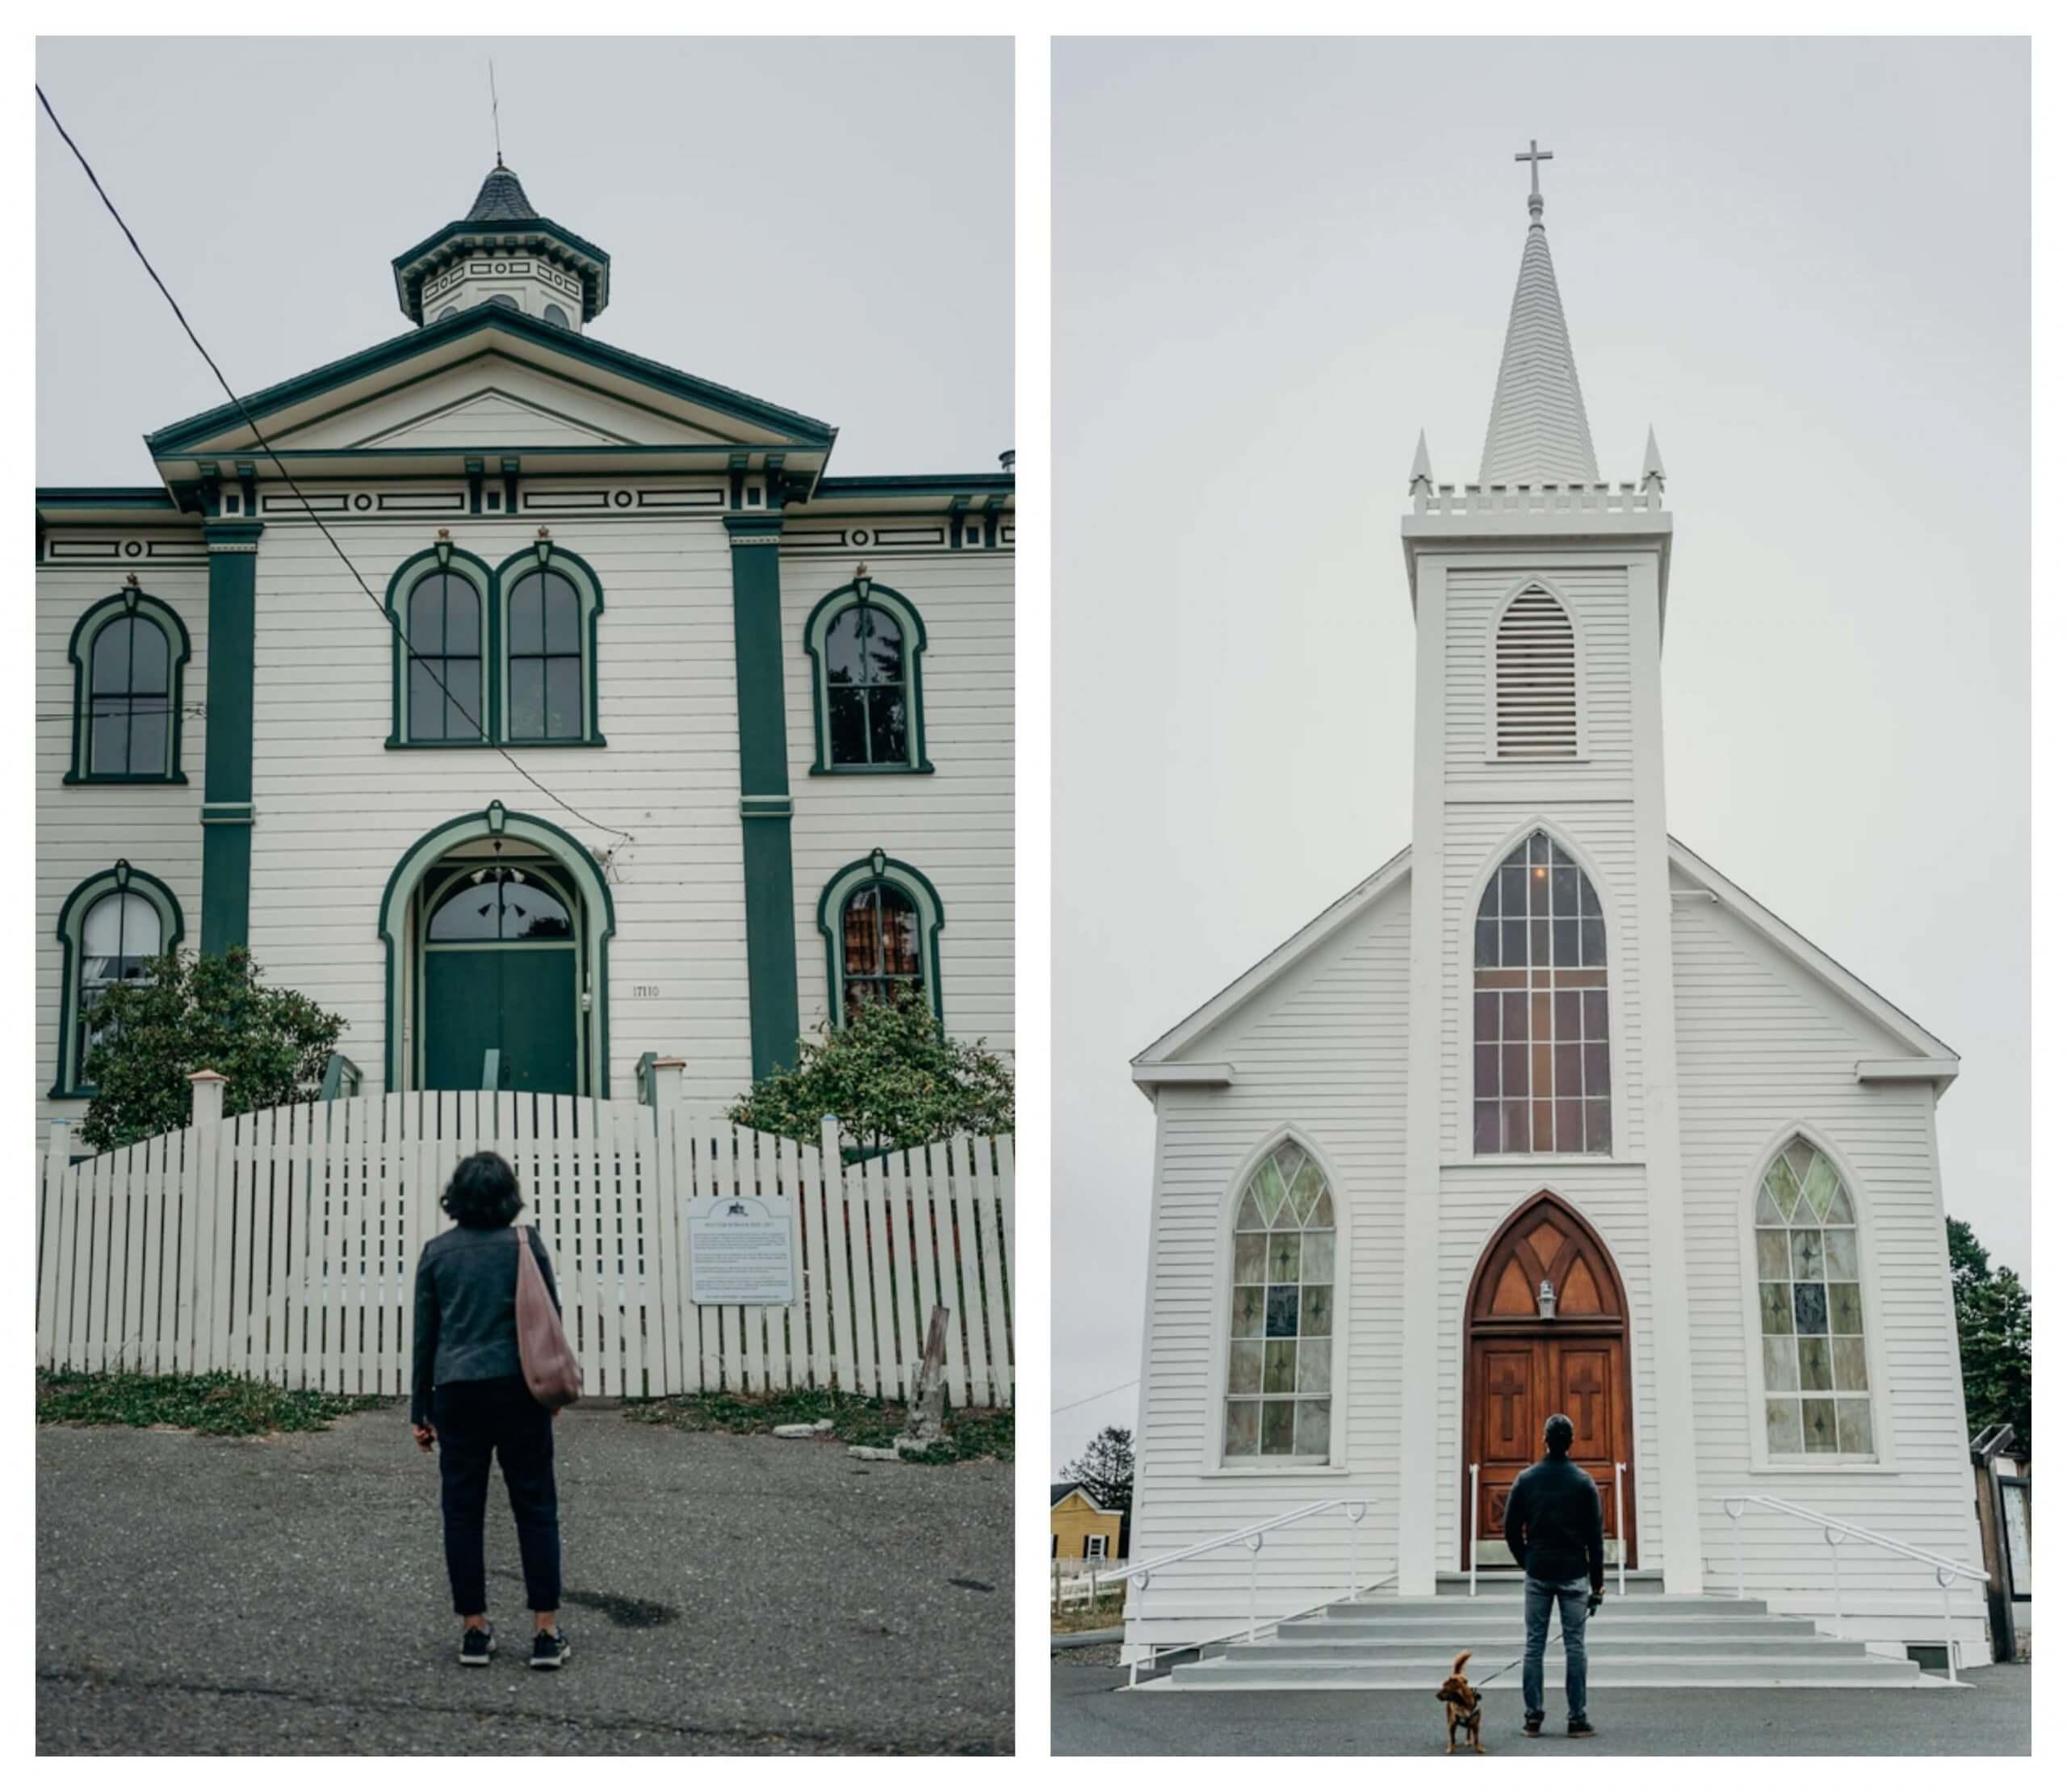 Potters High School and St. Teresa of Avila Church in Bodega